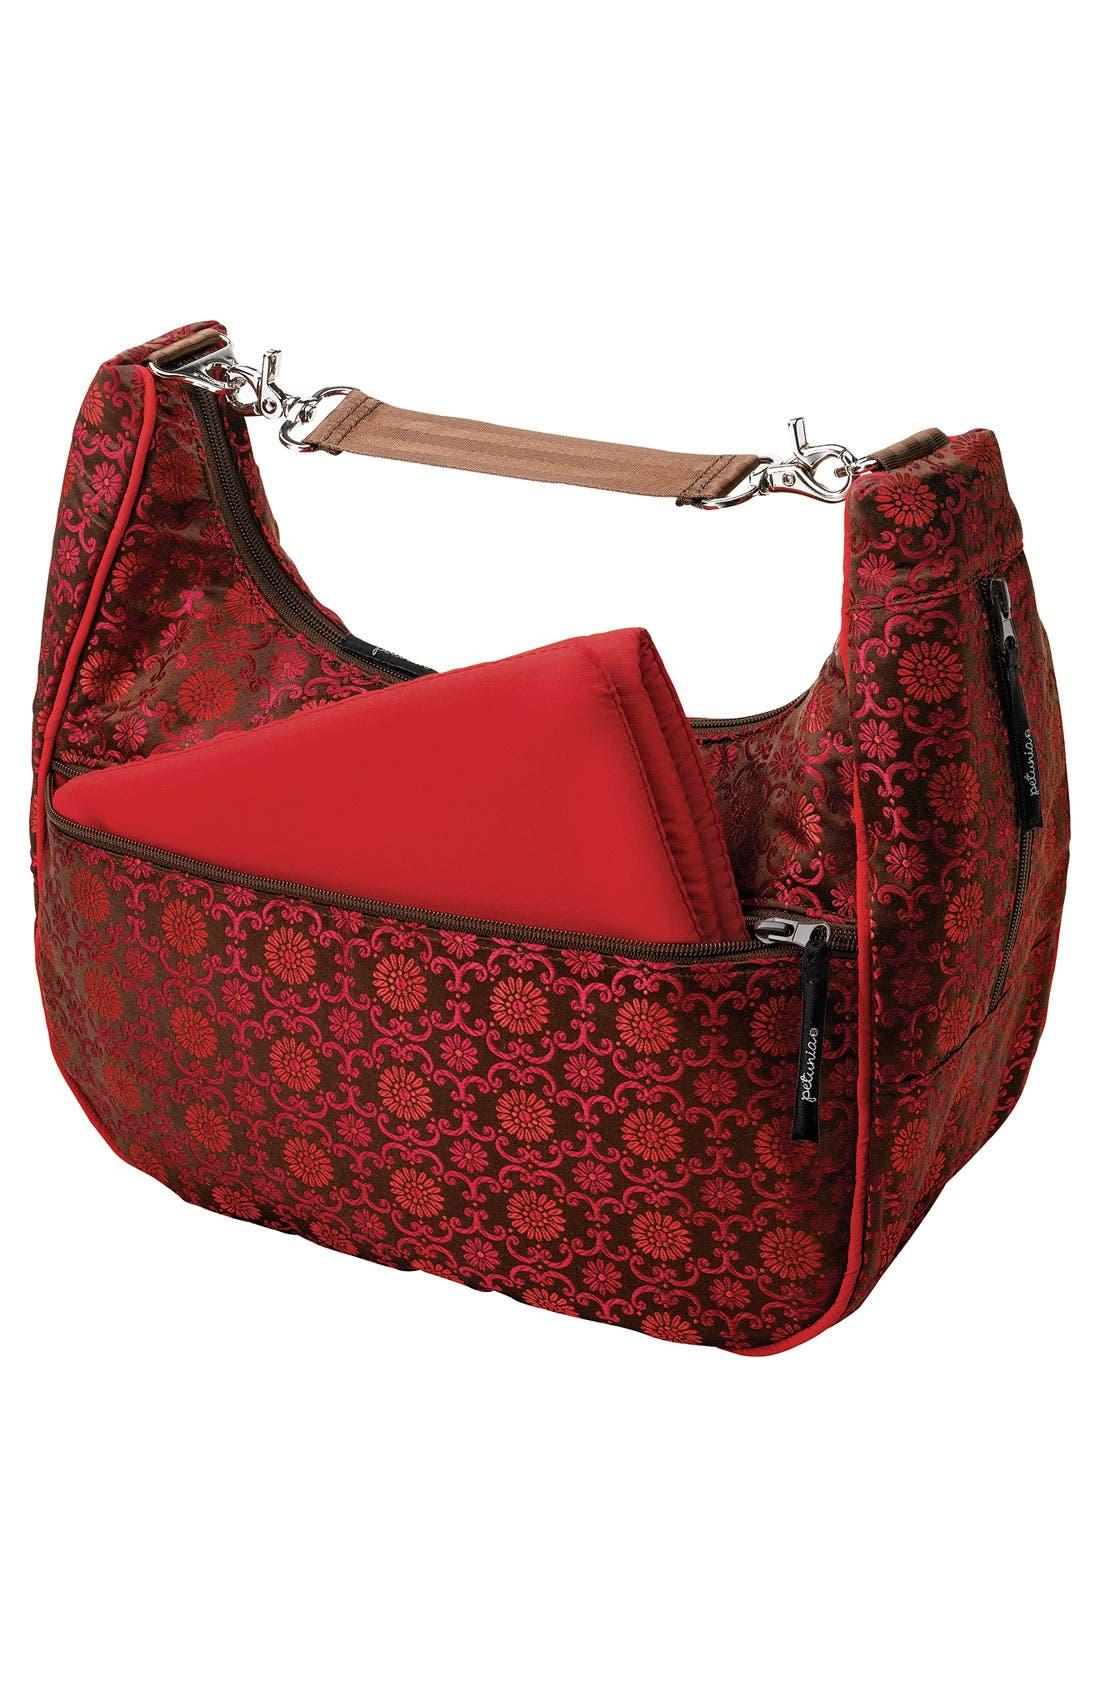 Alternate Image 2  - Petunia Pickle Bottom 'Touring Tote' Glazed Diaper Bag